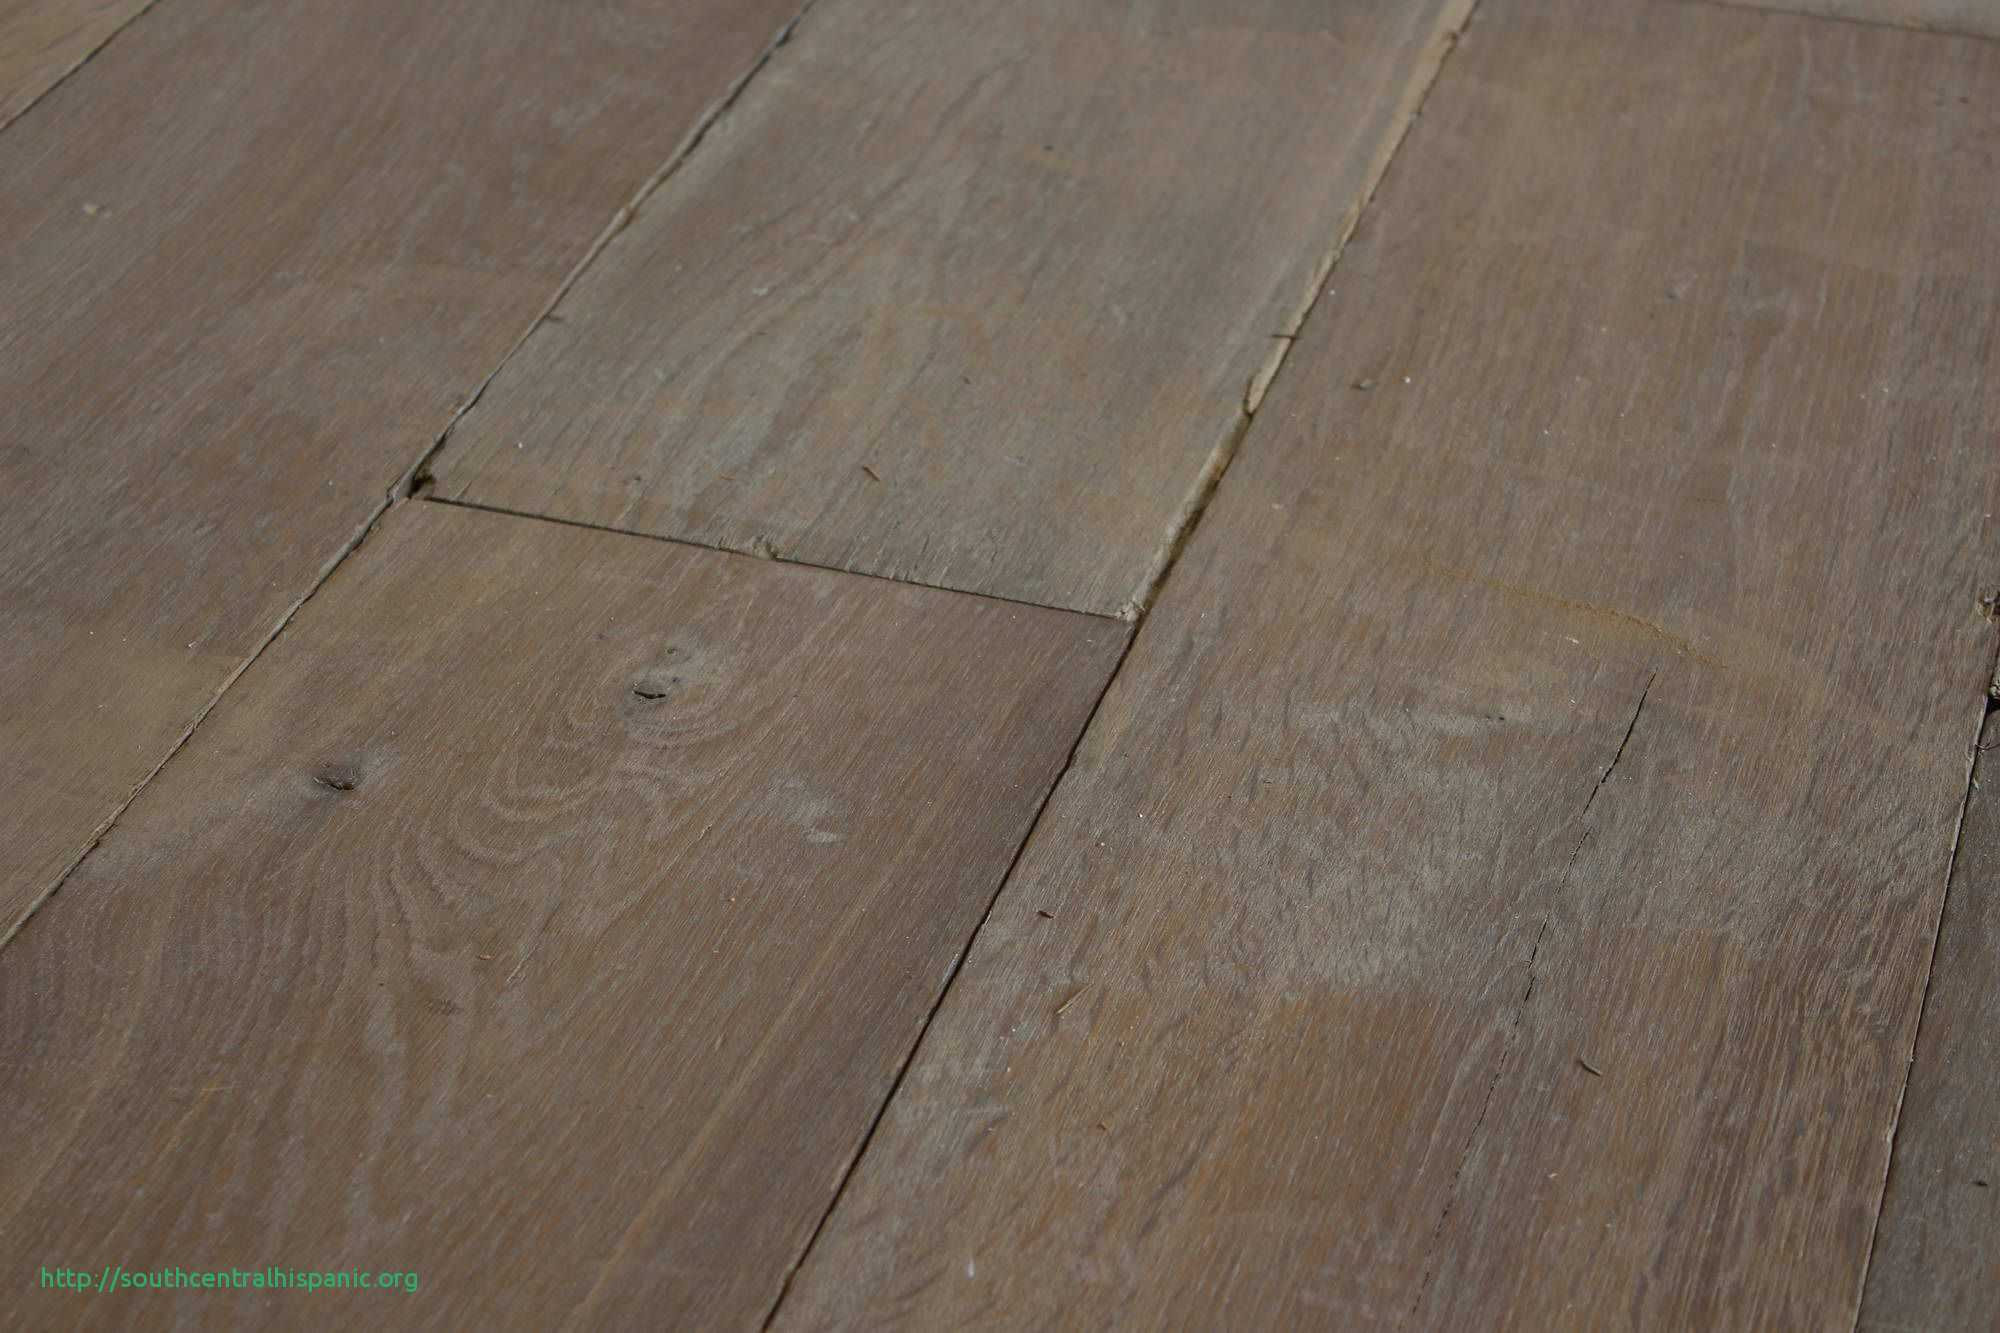 hardwood flooring toronto of vintage flooring toronto unique engaging discount hardwood flooring regarding vintage flooring toronto beau using our live sawn and air dried french oak planks vintage